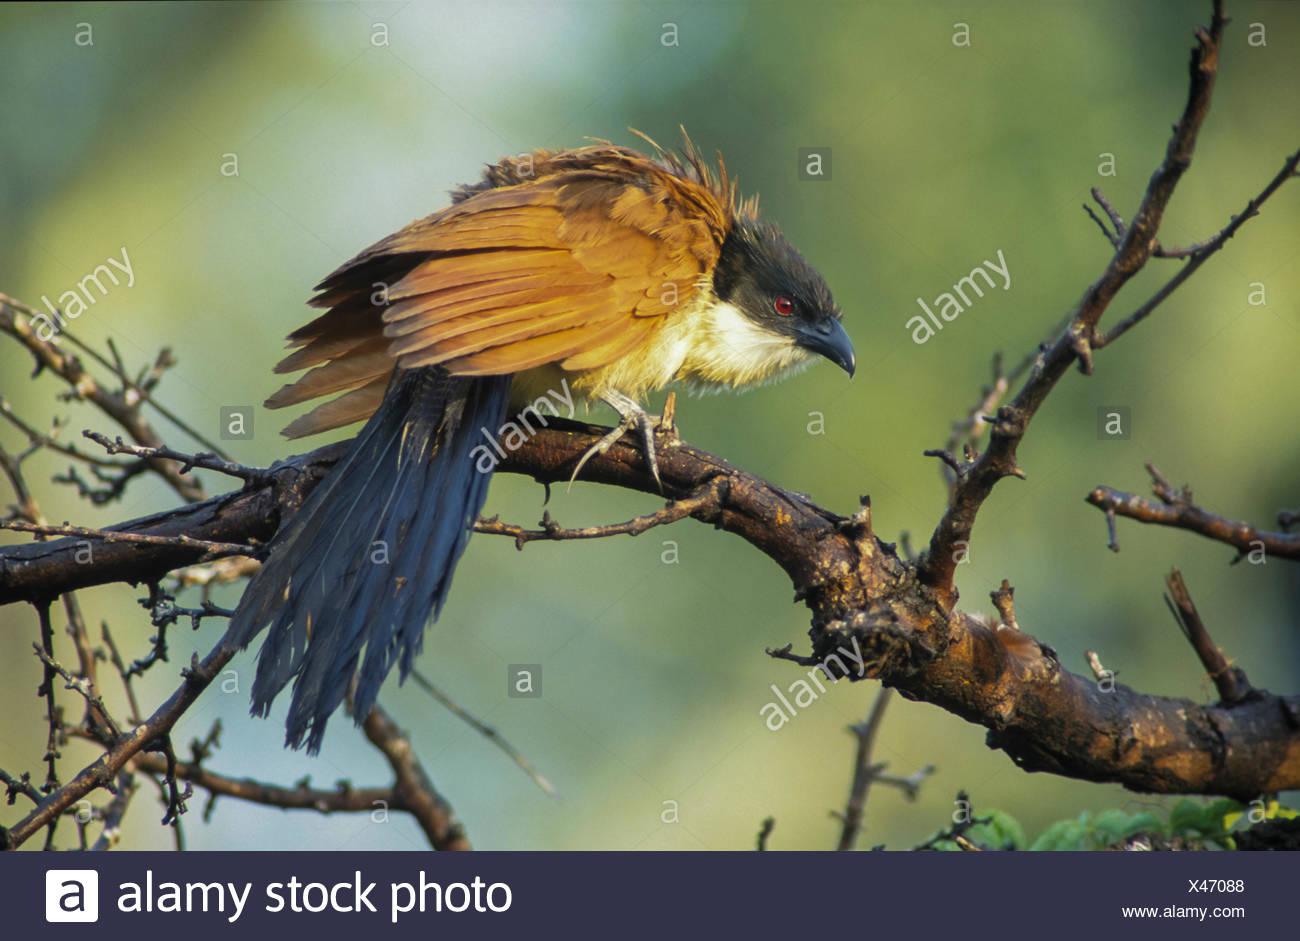 Burchell's Coucal (Centropus burchelli), ruffling up its plumage, Mkuzi Game Reserve, KwaZulu-Natal, South Africa - Stock Image